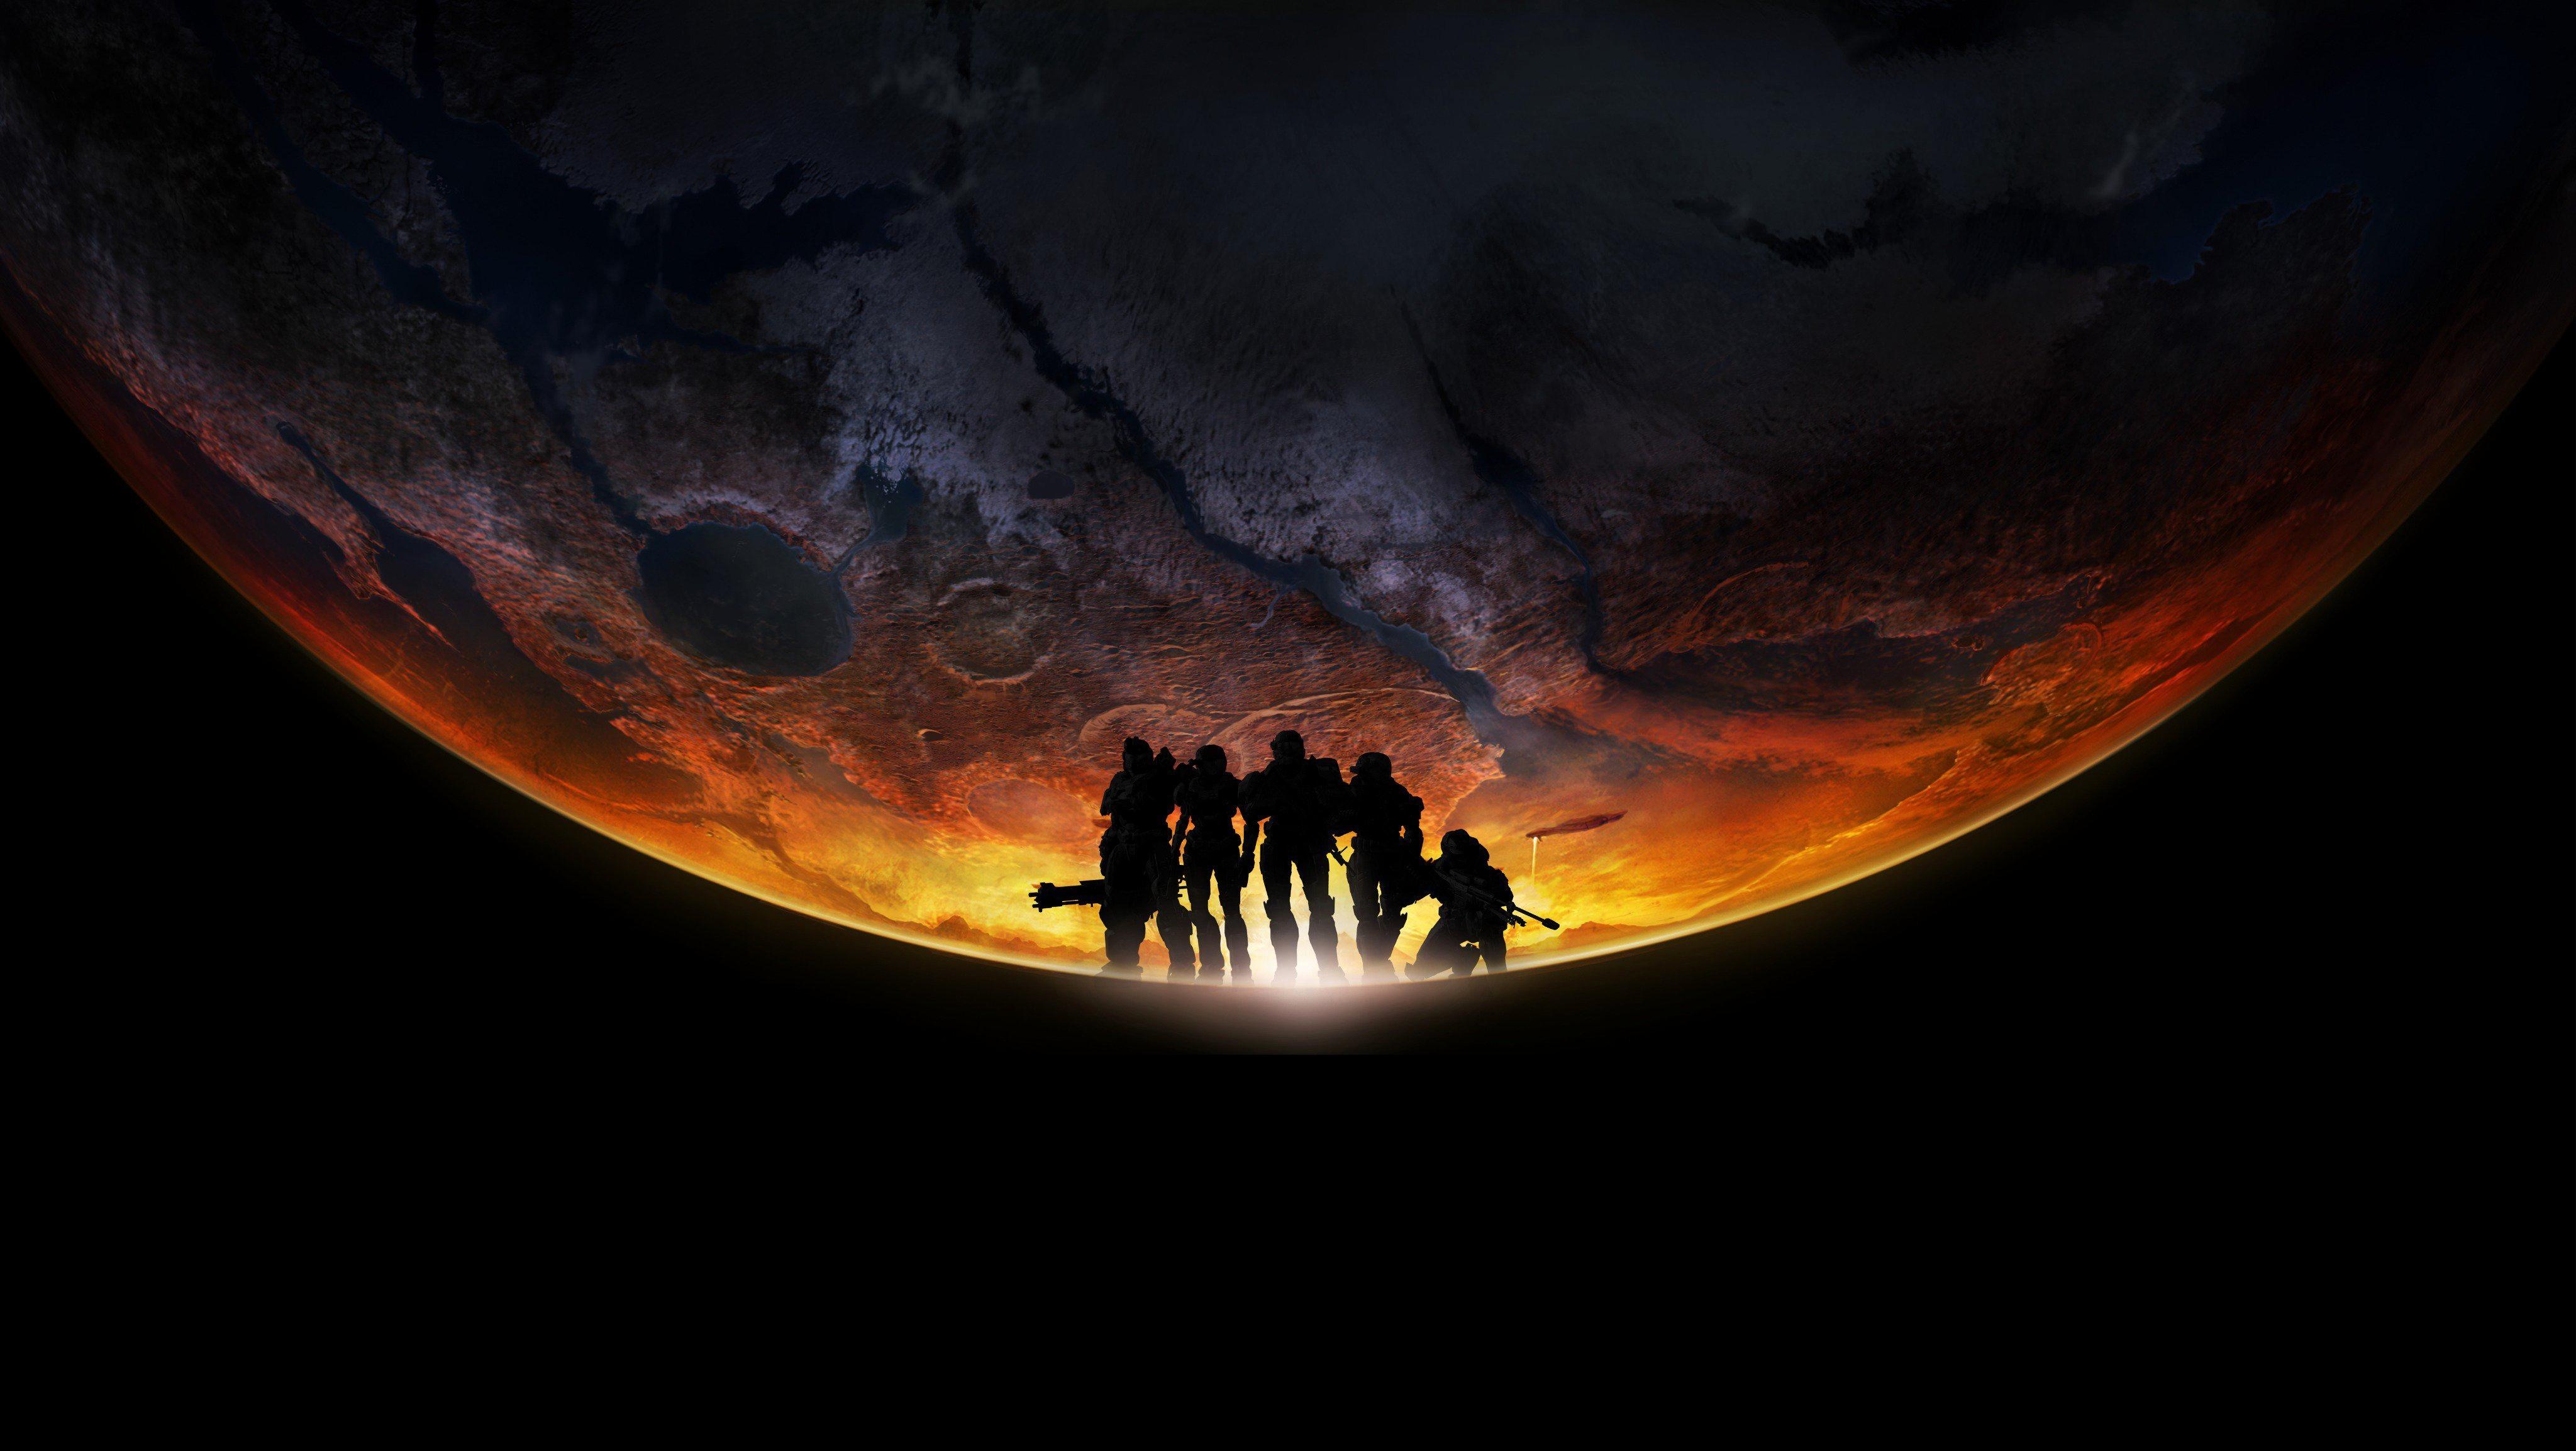 Halo Reach - 4096x2307 - Download HD Wallpaper - WallpaperTip